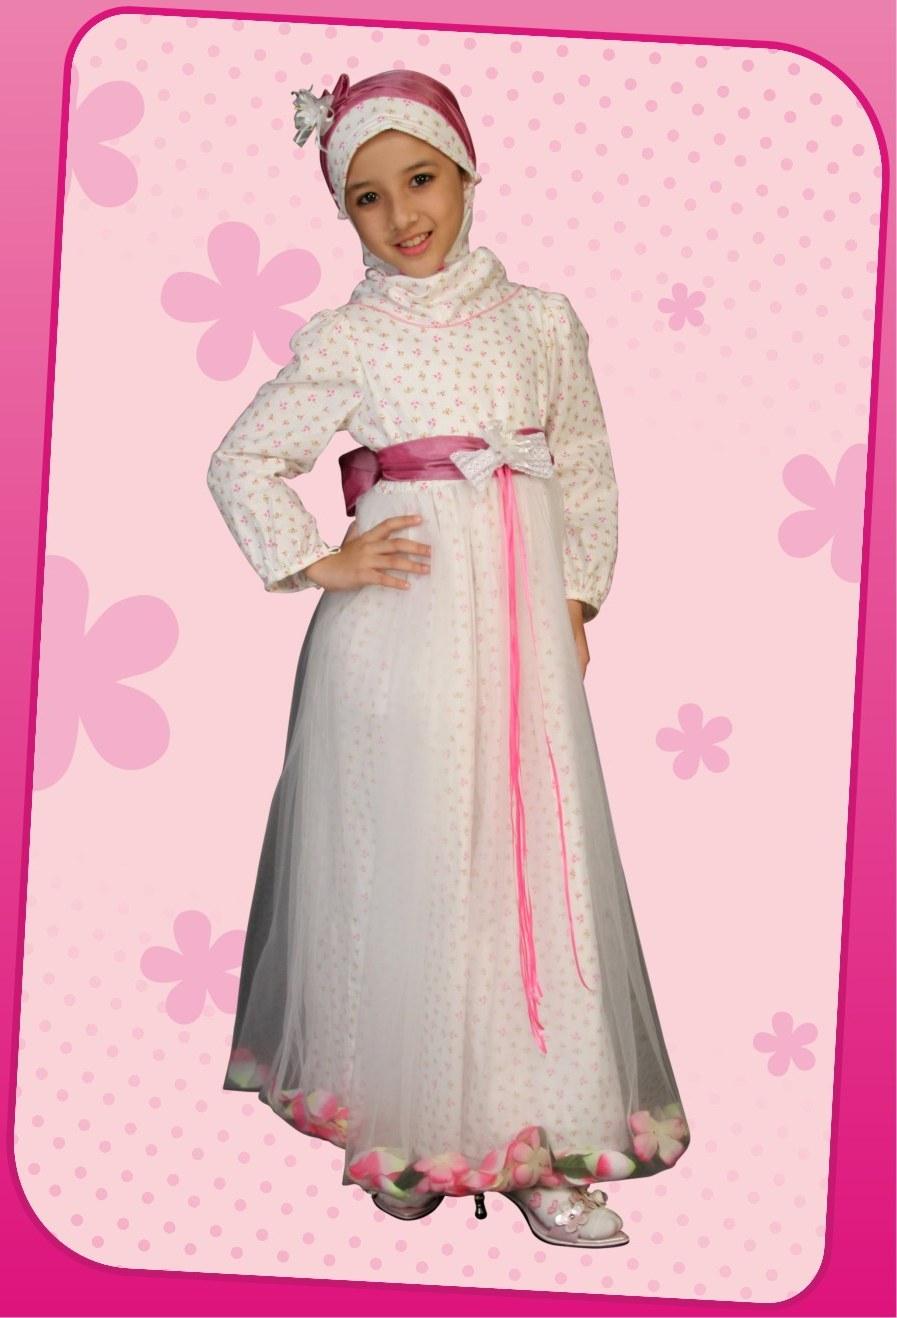 inspirasi baju lebaran anak perempuan umur 11 tahun e6d5 trend busana muslim anak perempuan 2016 busana muslim terbaru of baju lebaran anak perempuan umur 11 tahun